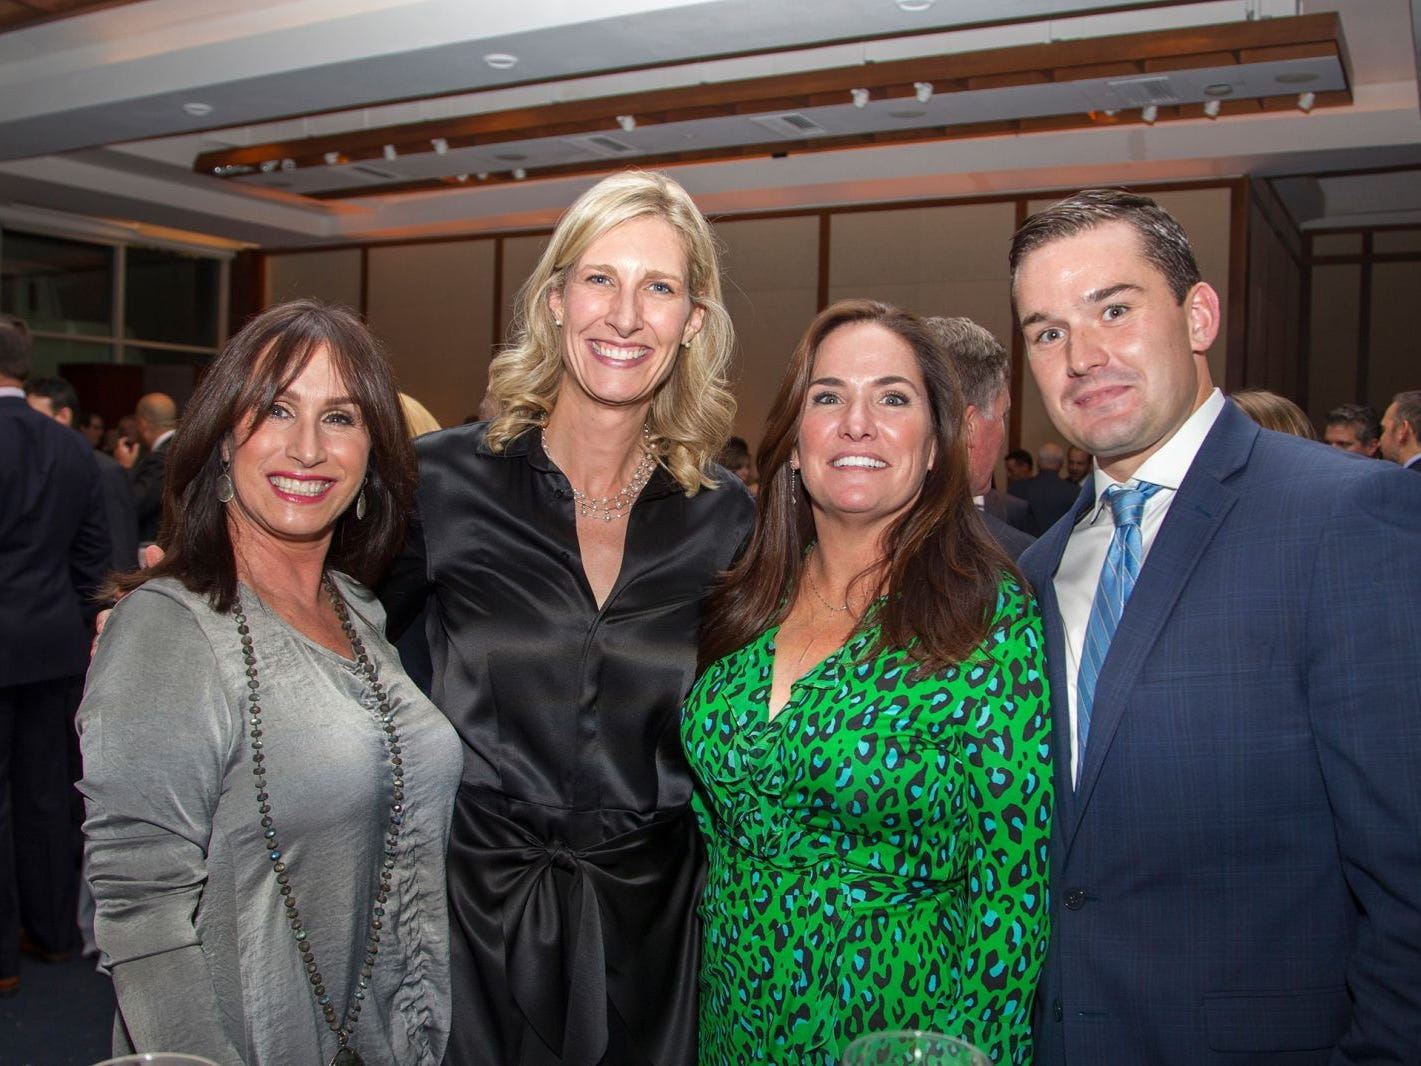 Kerri Holder, Susan Kwon, Kelly and Chris Larson. 11th annual IronMatt Fundraiser Gala at Pier 60 Chelsea Piers. 09/20/2018